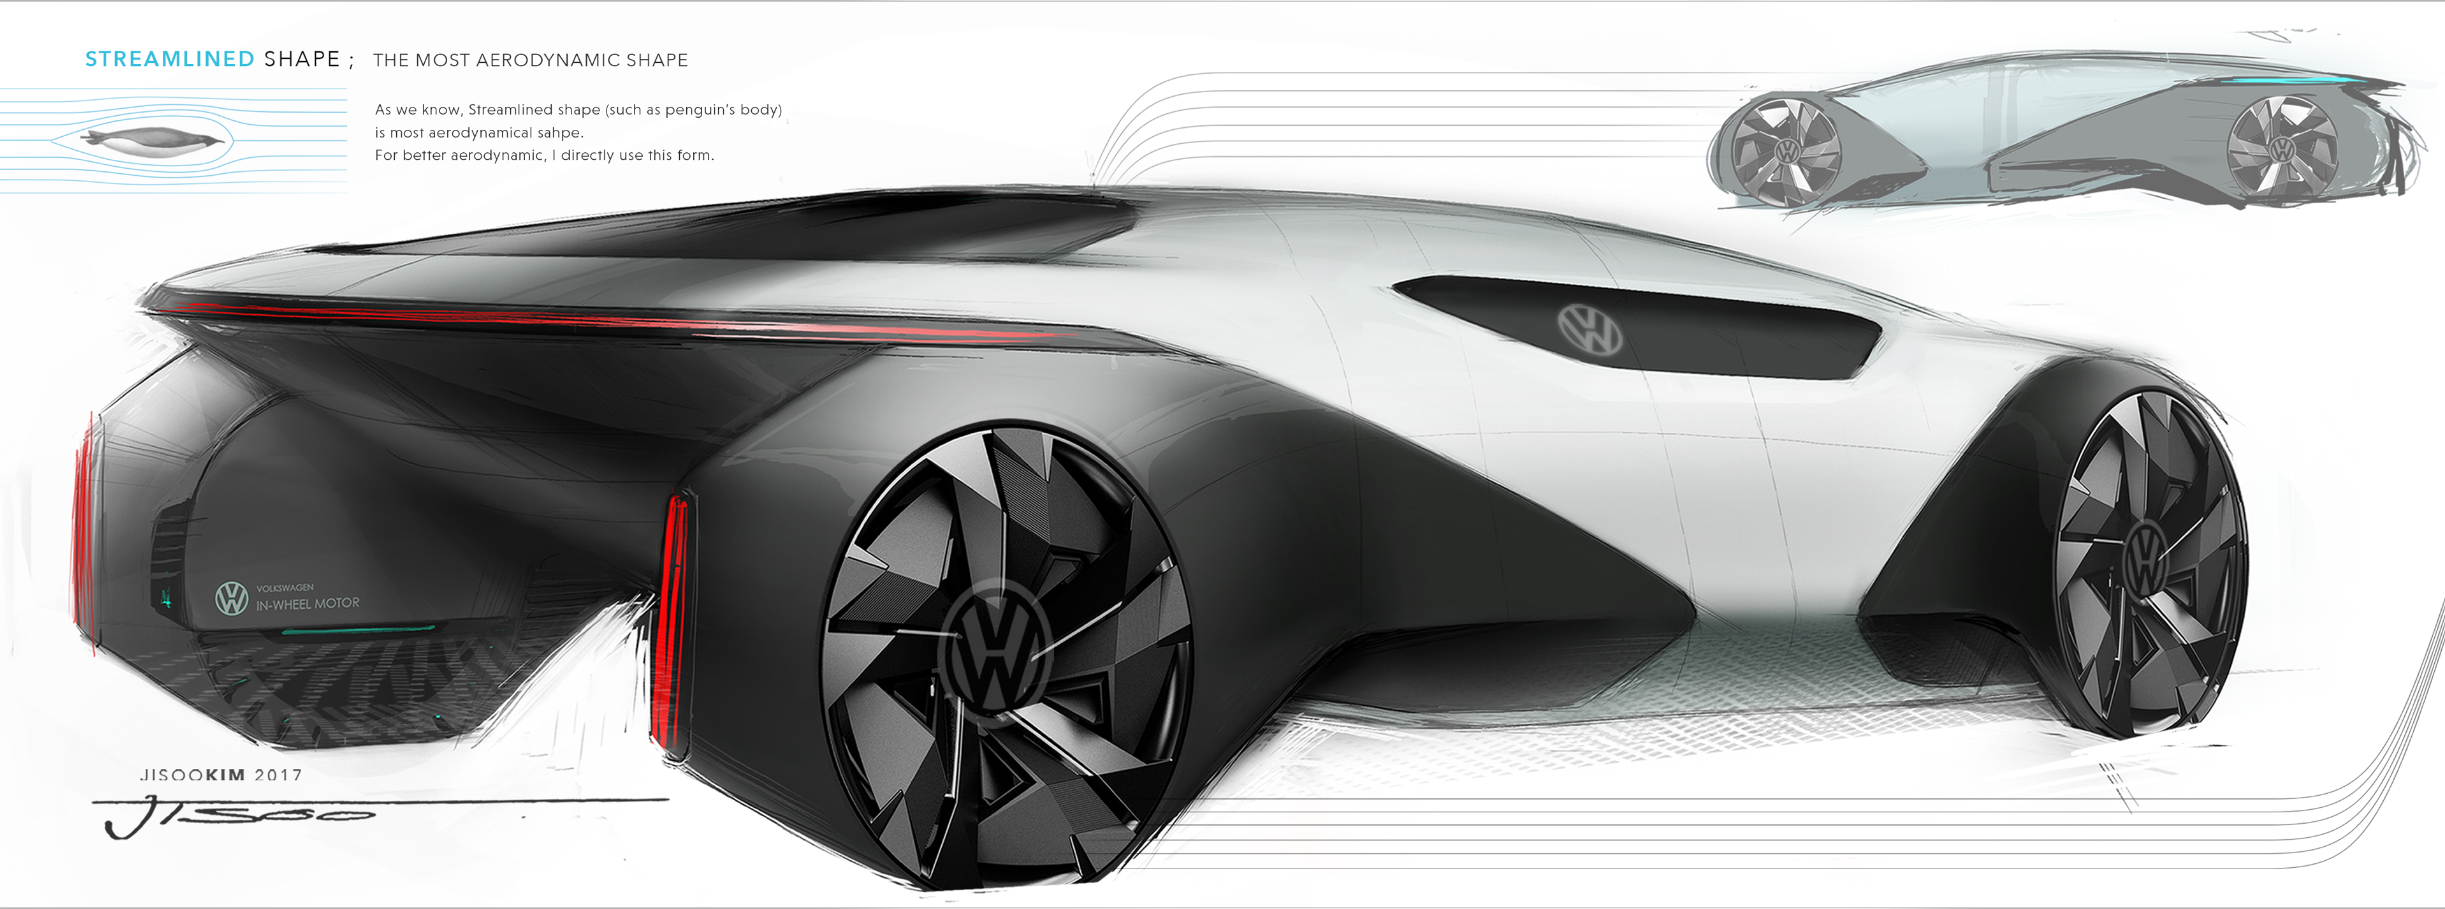 Inteligentny jisoo kim on Behance | Automotive sketches collection | Automotive NG96